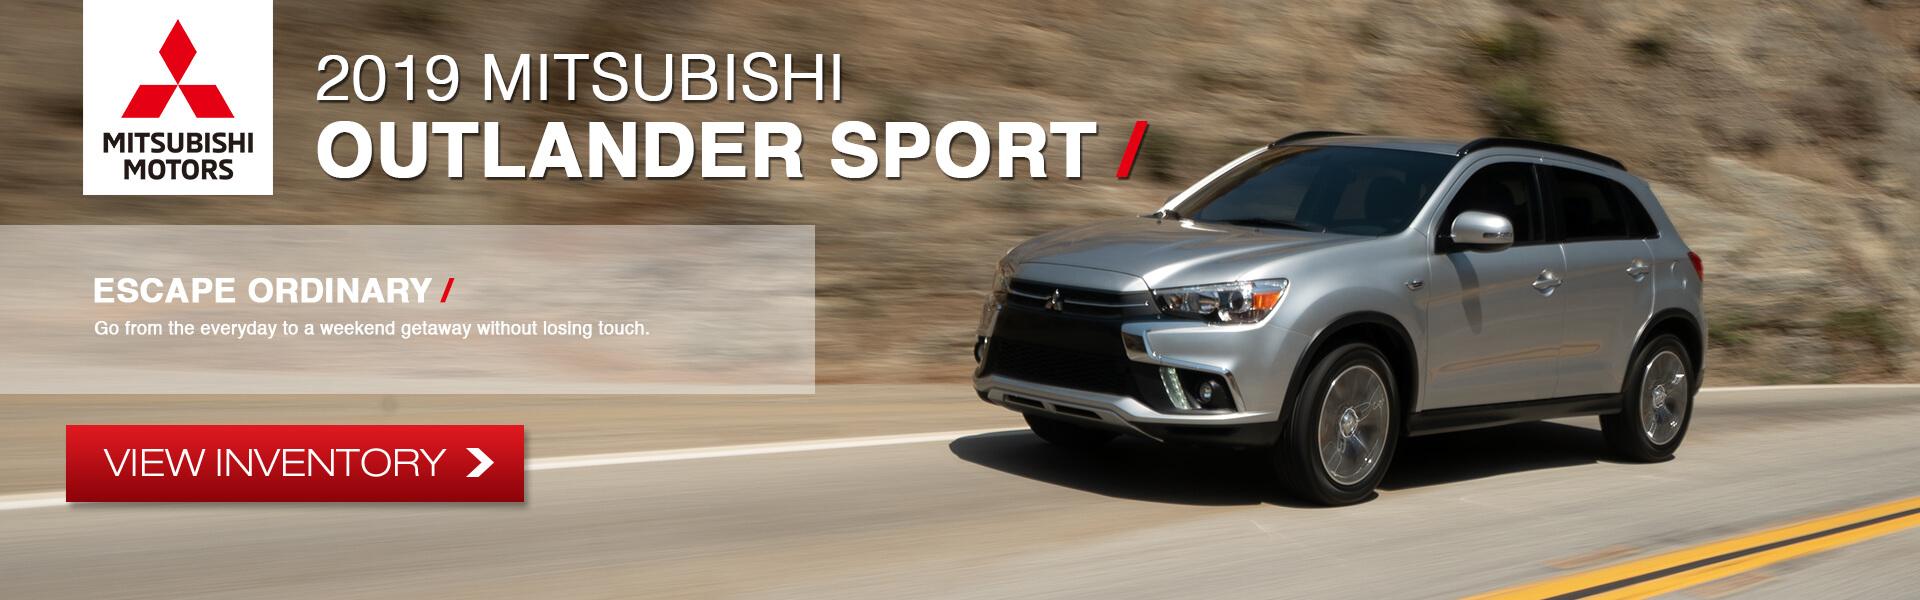 2018 Mitsubishi Outlander Sport Evergreen